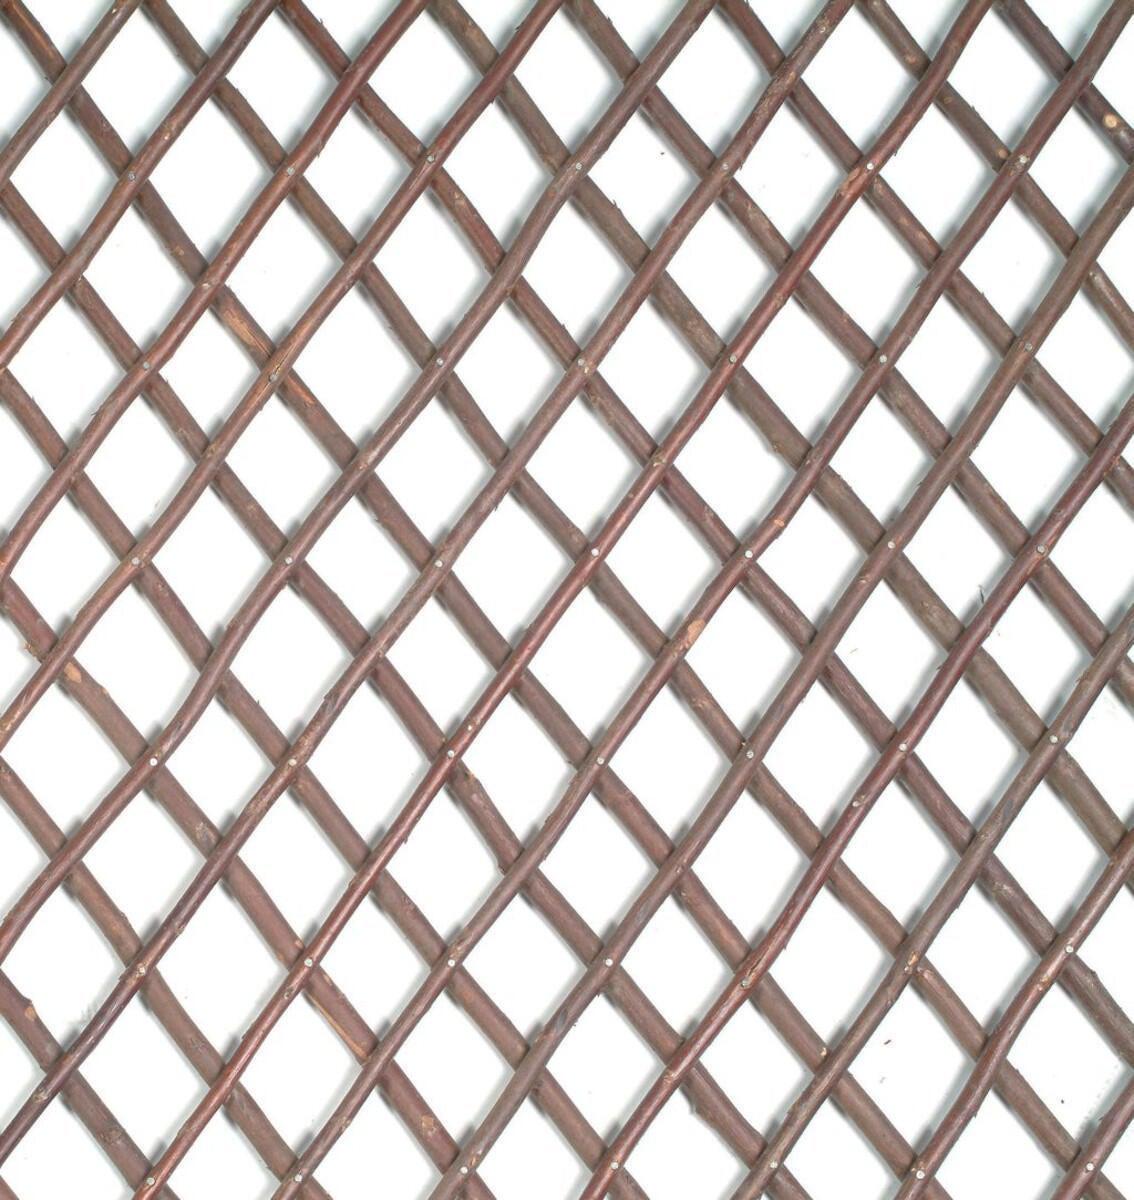 Traliccio estensibile Willow trellis in vimini L 200 x H 100 cm , spessore 7 mm